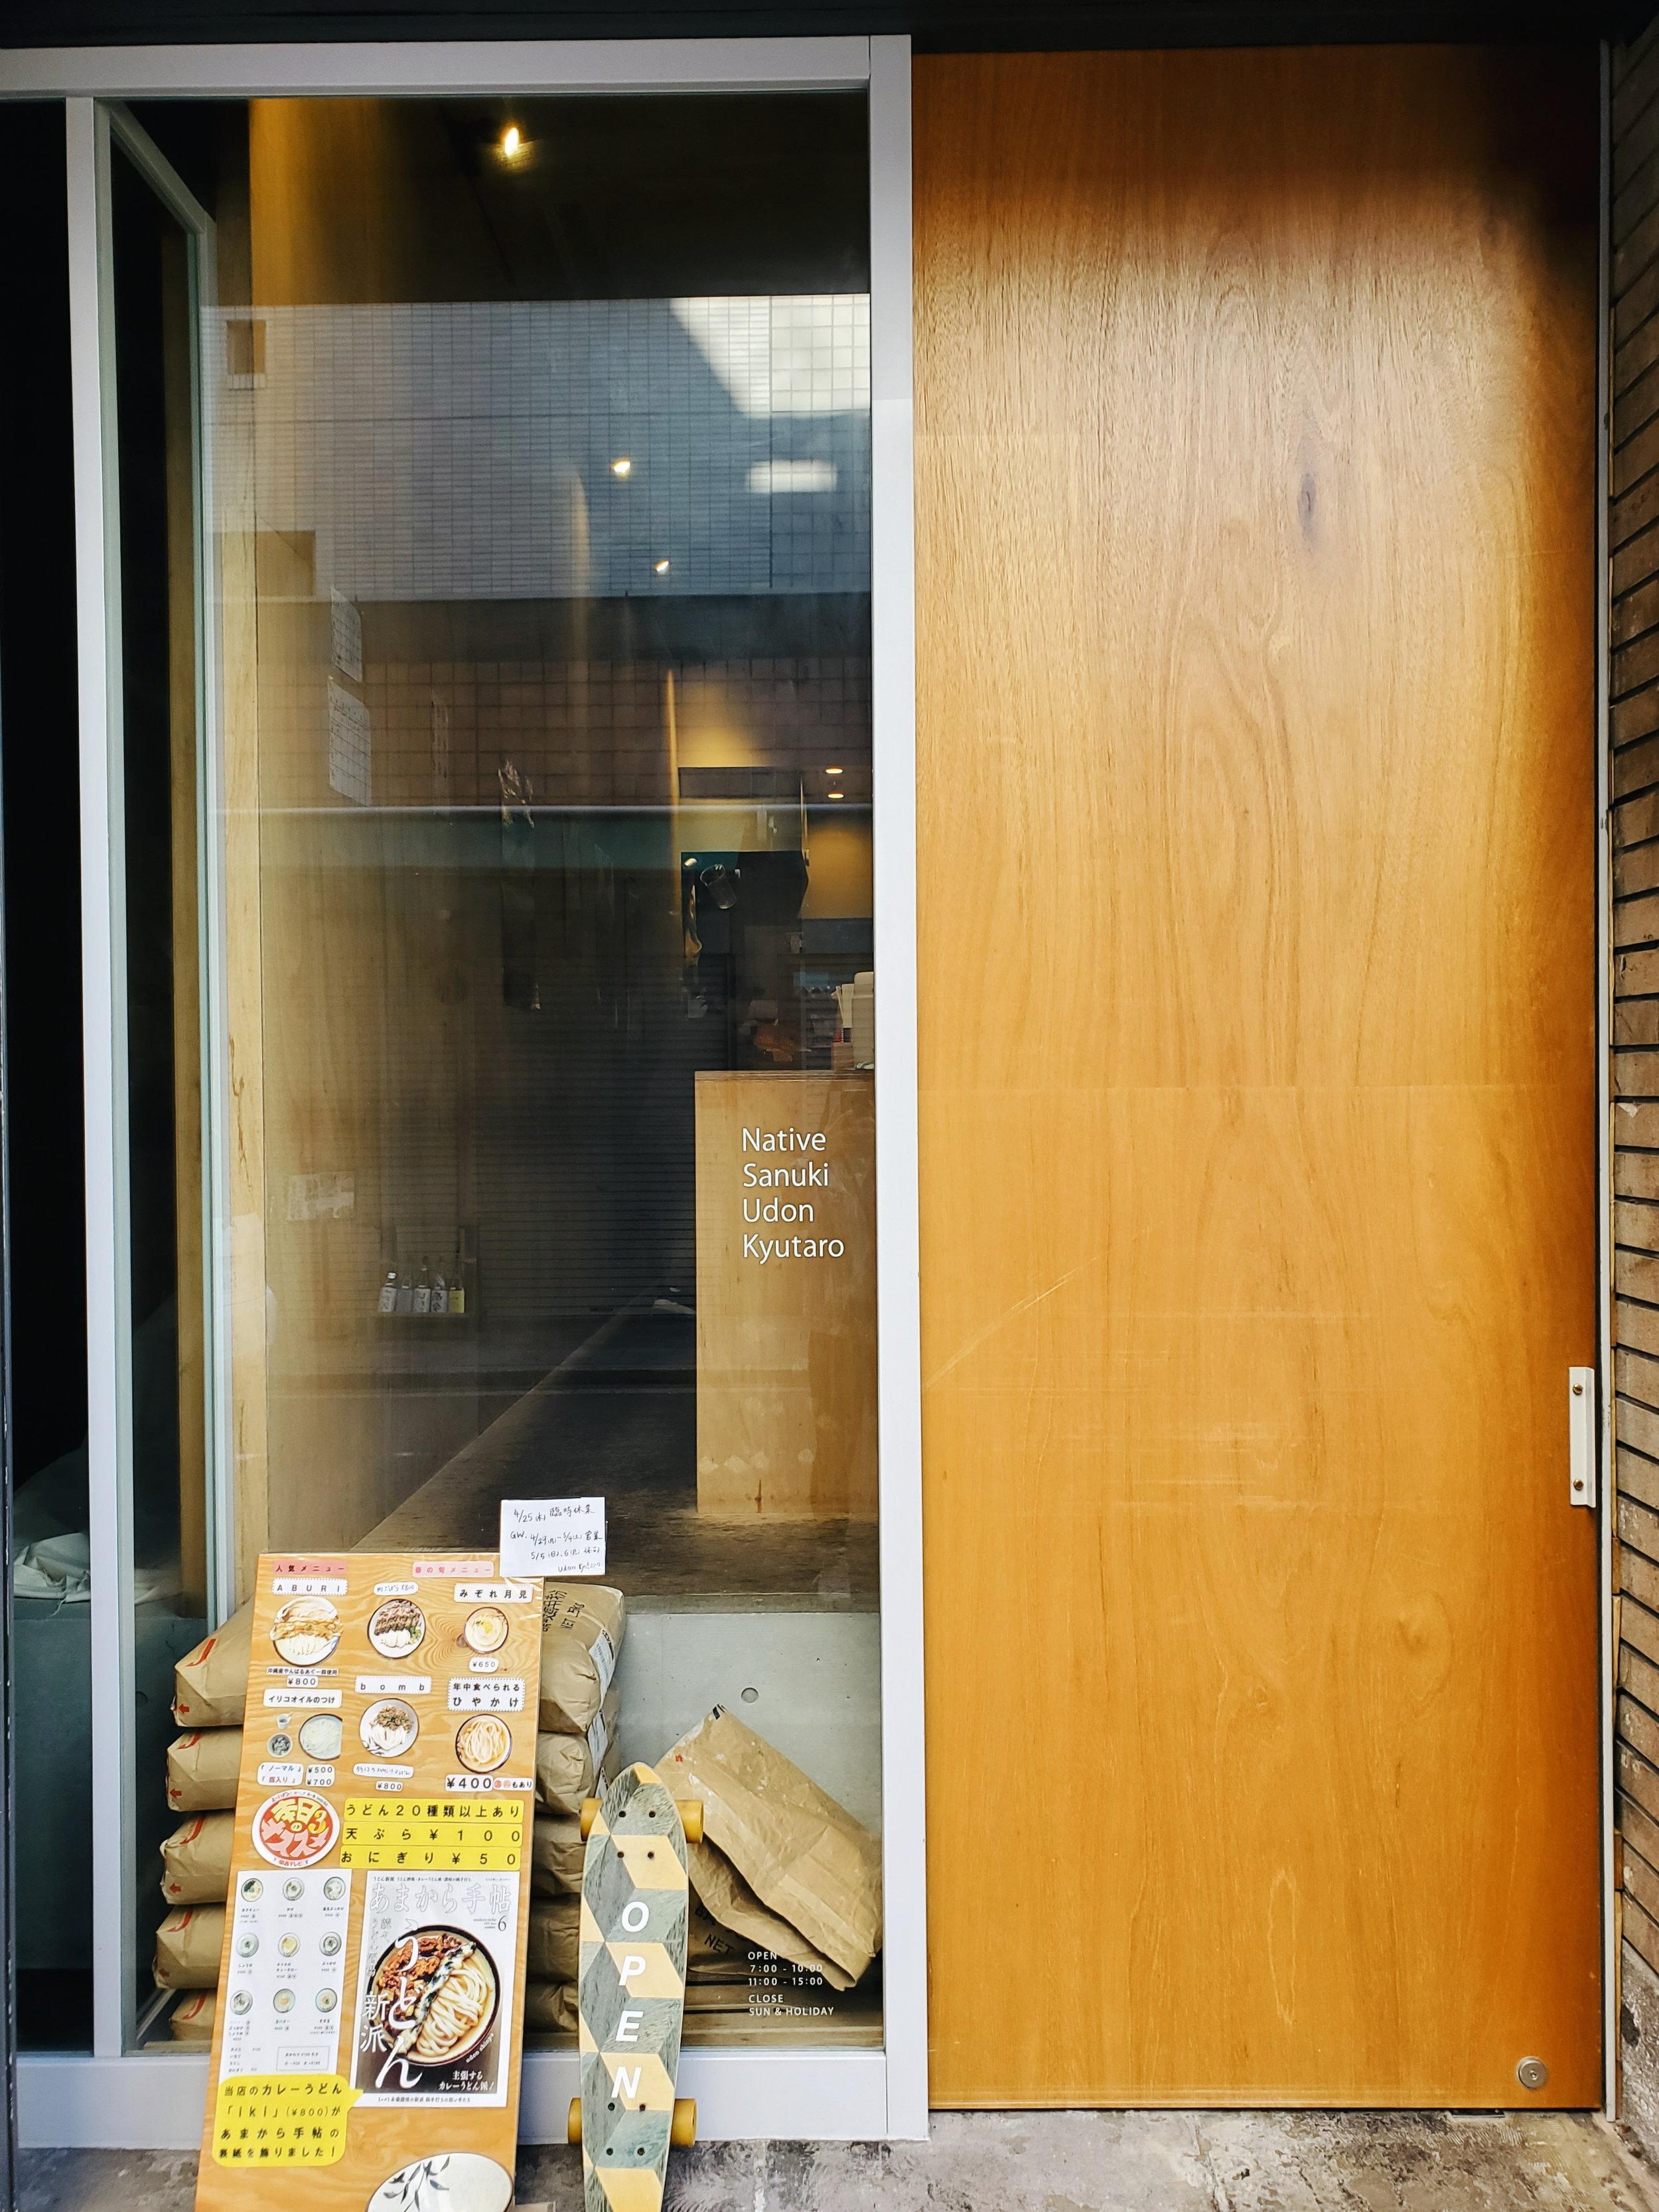 udon-kyutaro-10.jpg